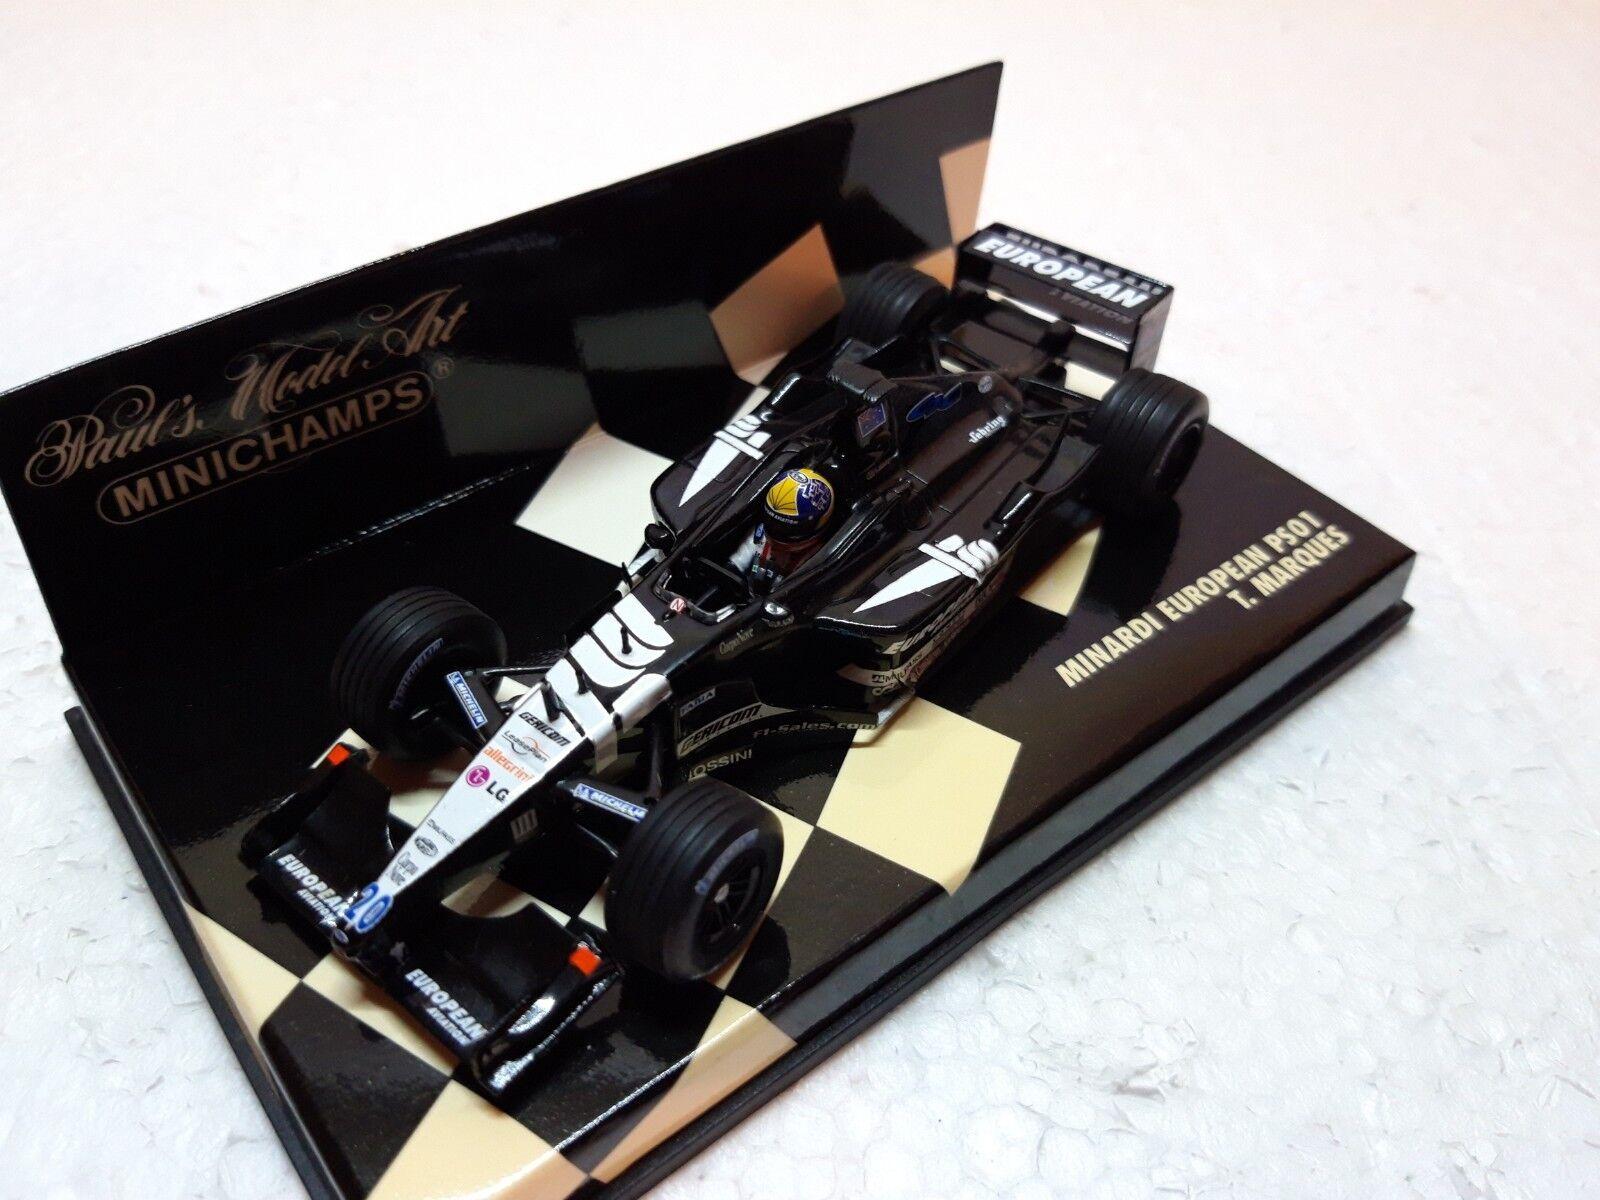 Minardi European PS01 T. Marques • 2001 • Minichamps • 1 43